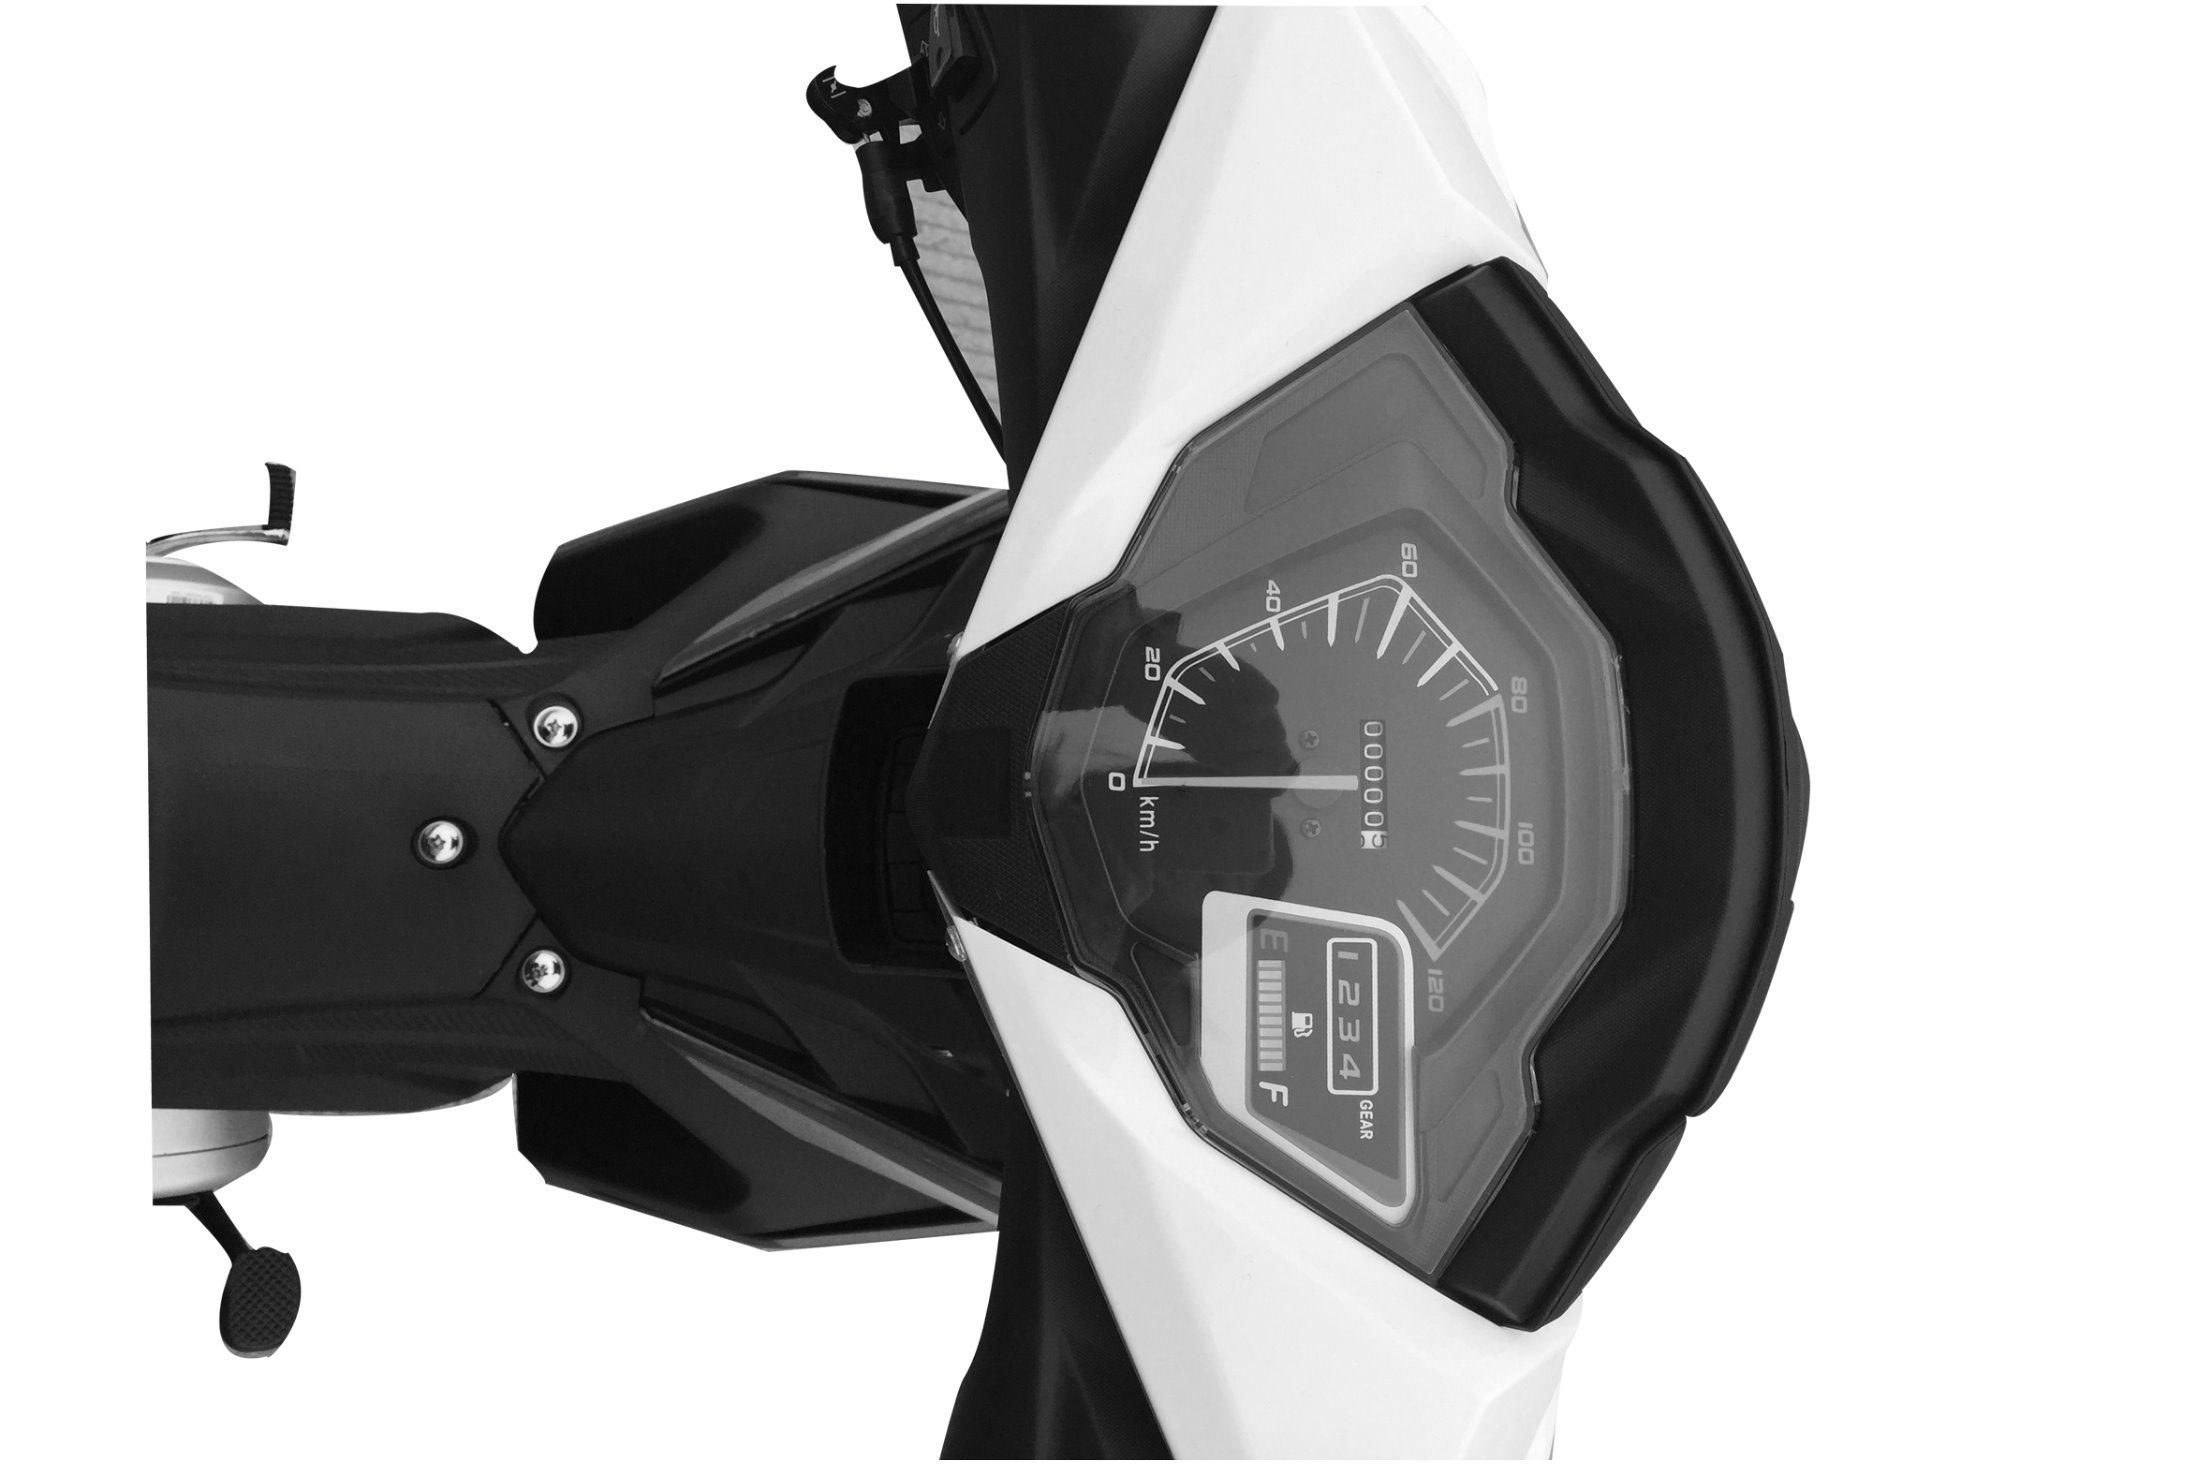 125cc Cub Motorcycle